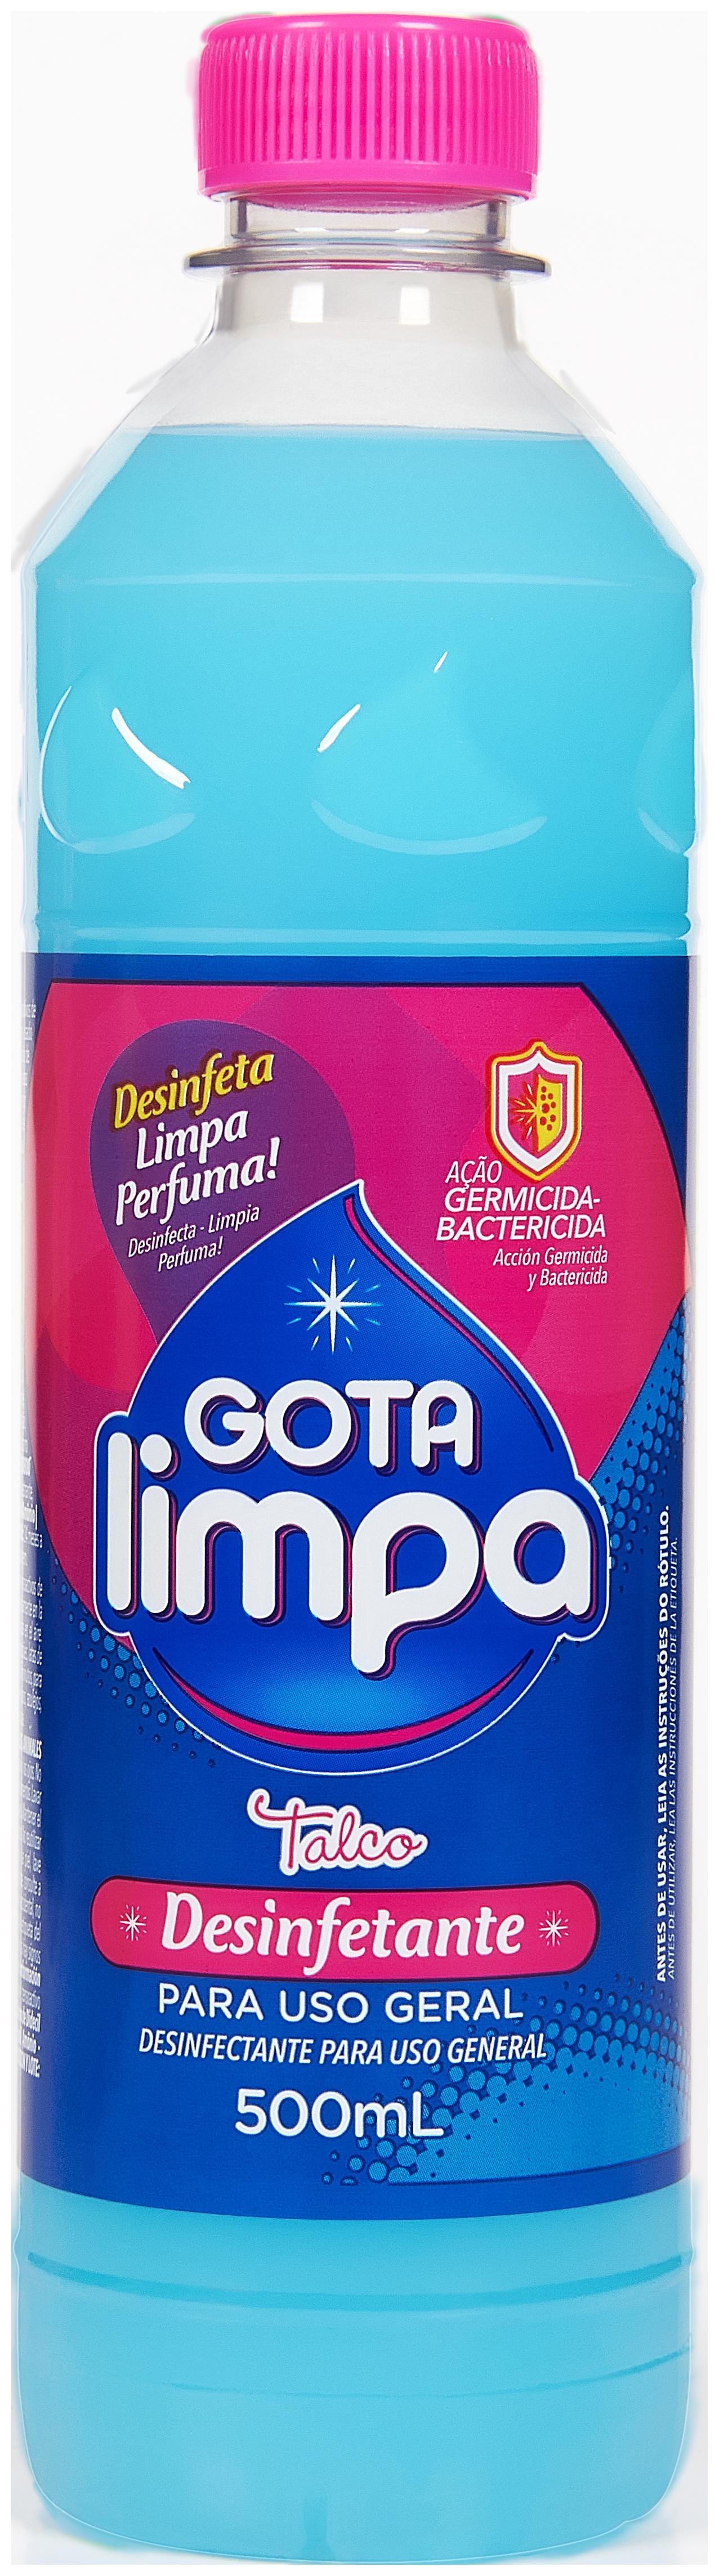 Desinfectante Gota Limpa Talco 500ml